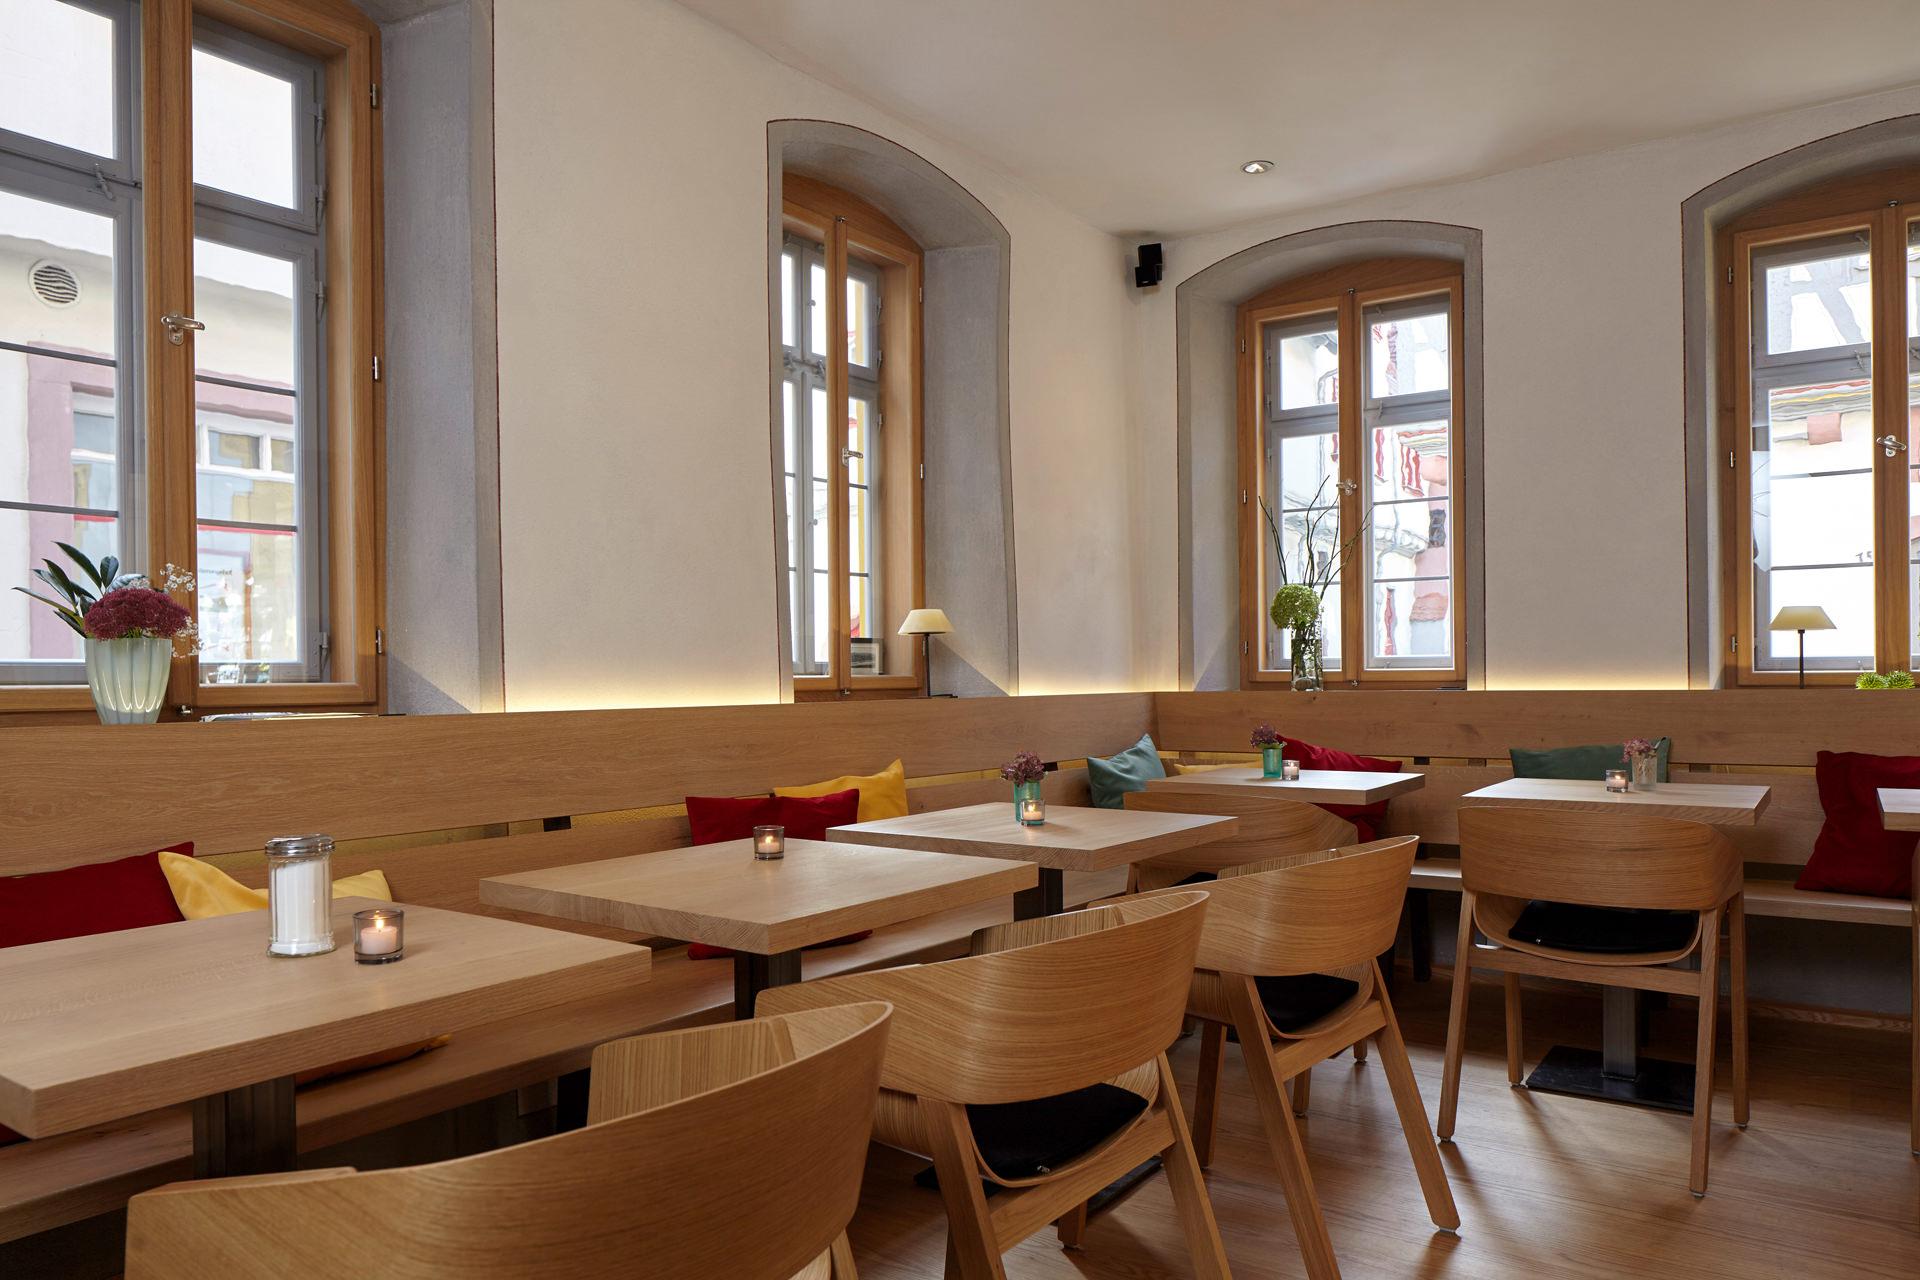 Cafe-Denkmal-Karlstadt-Gastraum